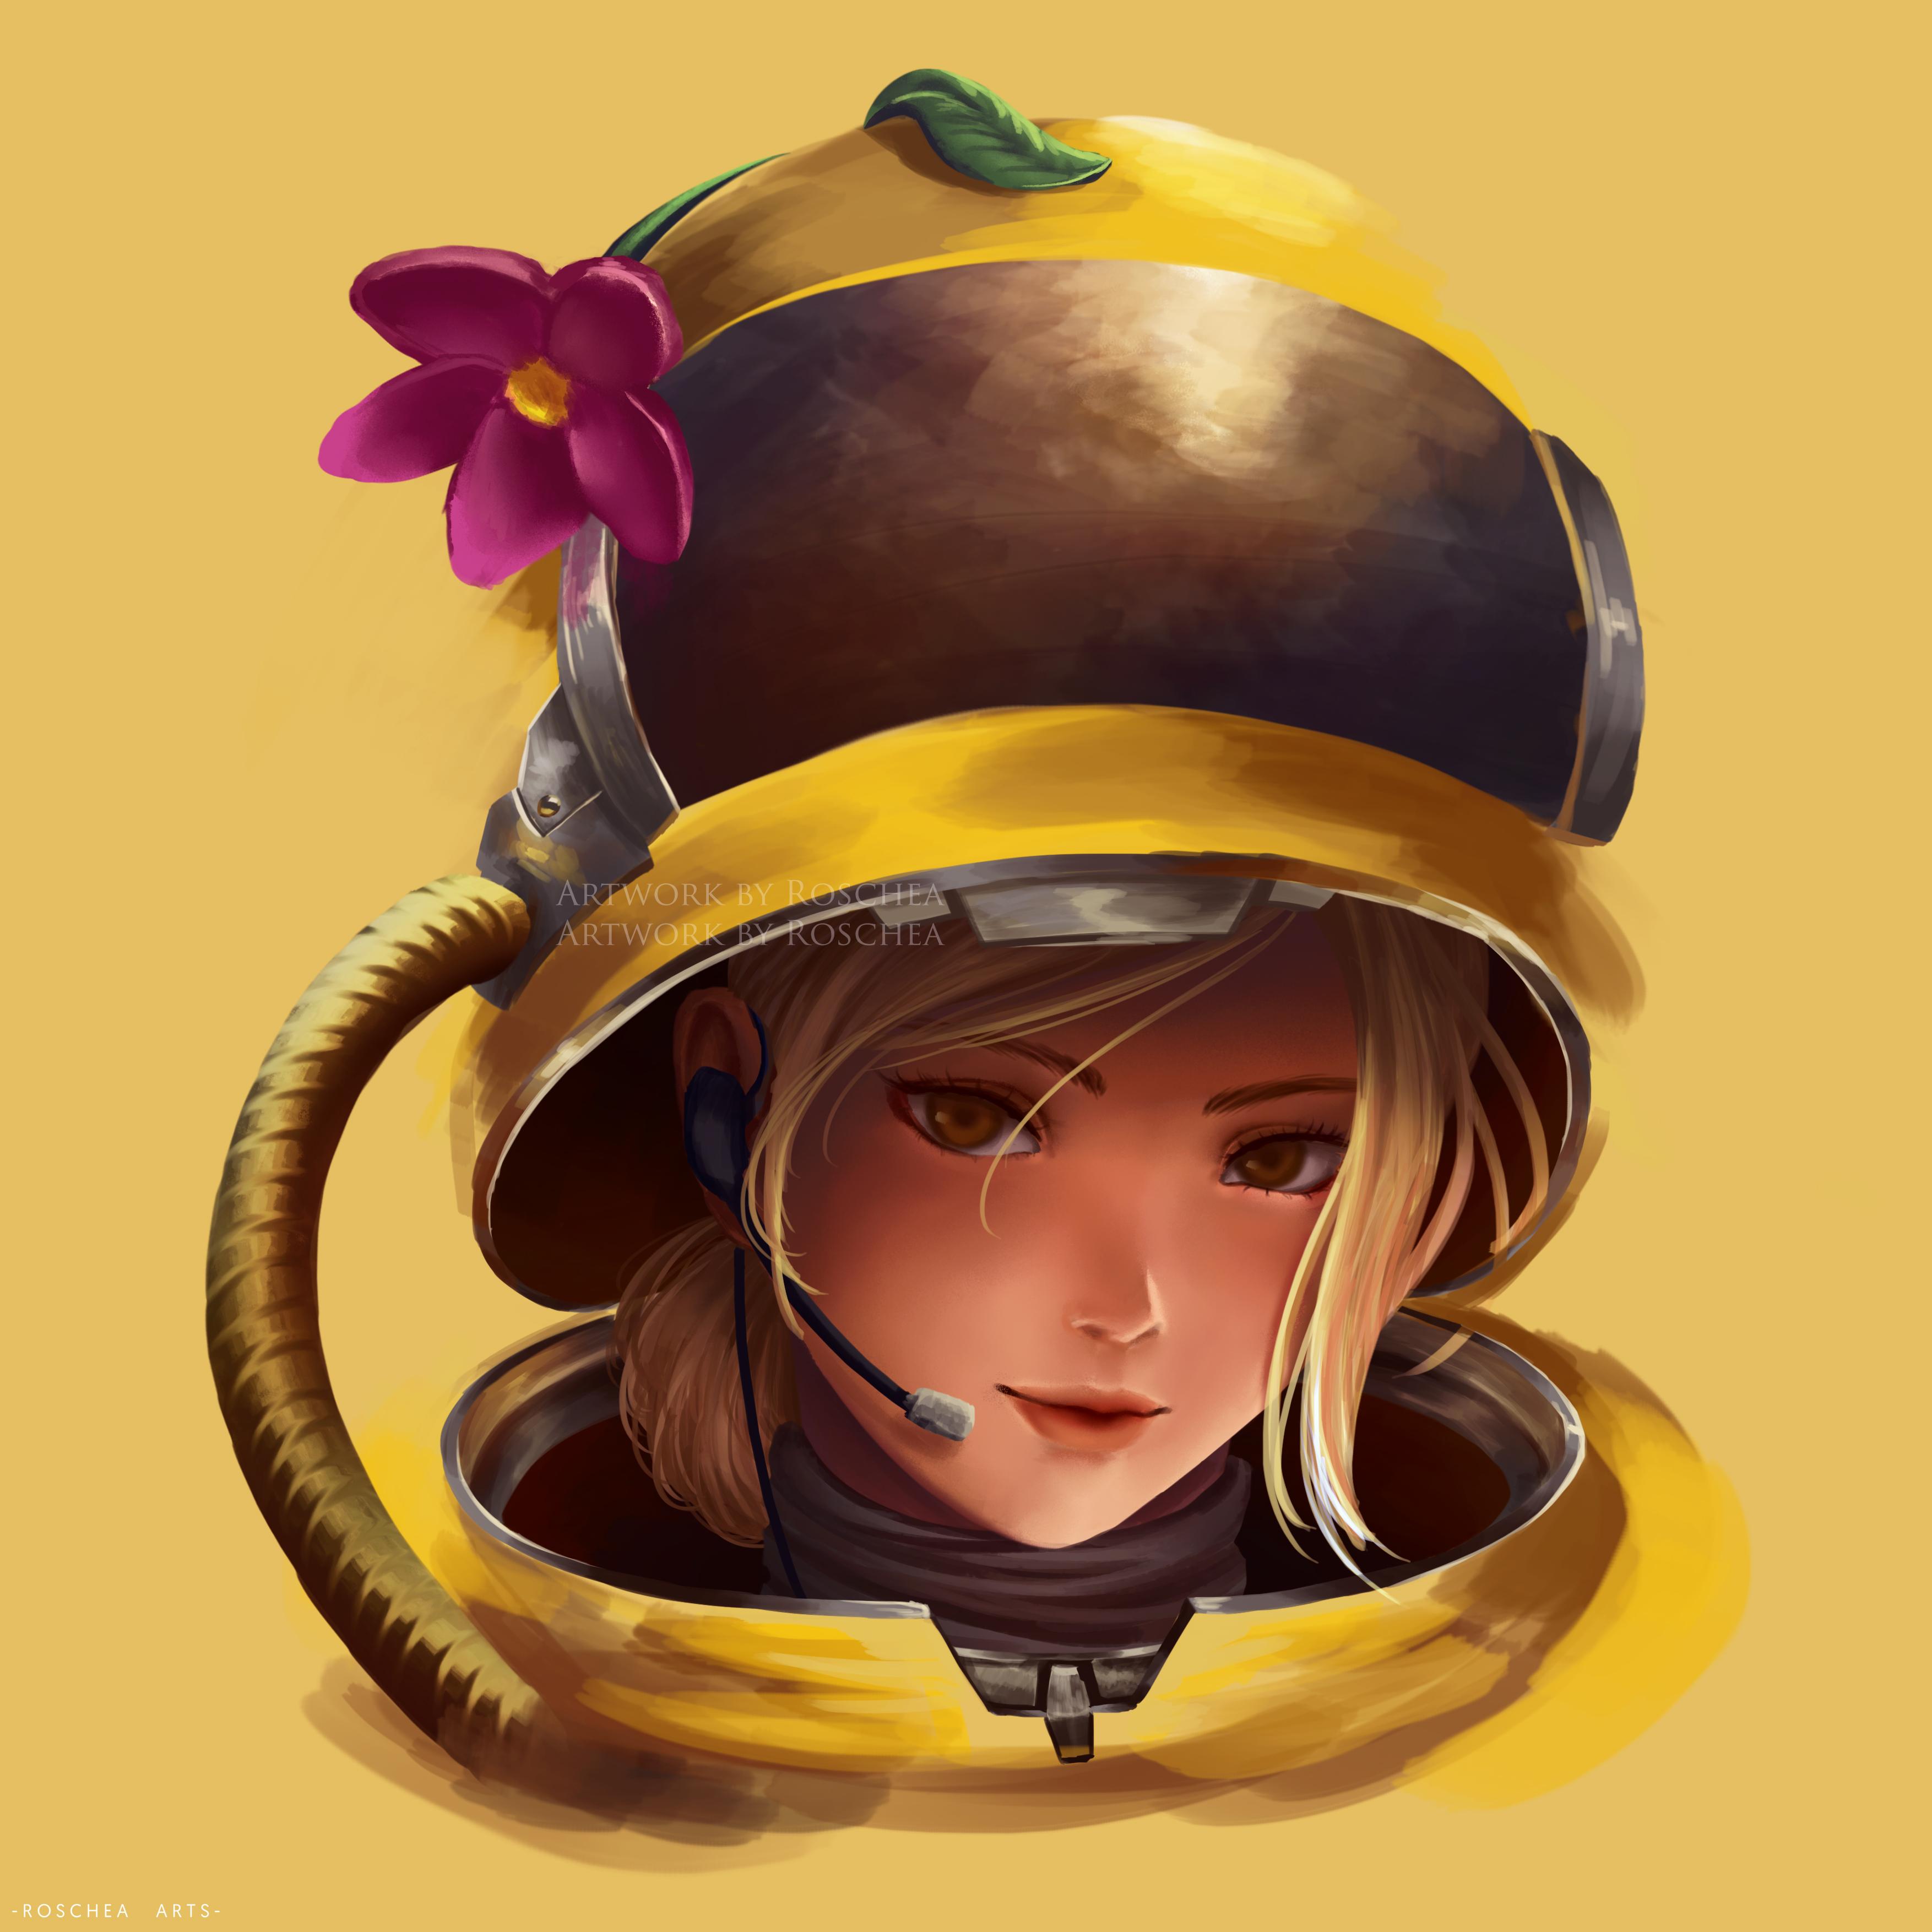 Female Anime Female Among Us Character Anime Wallpaper Hd